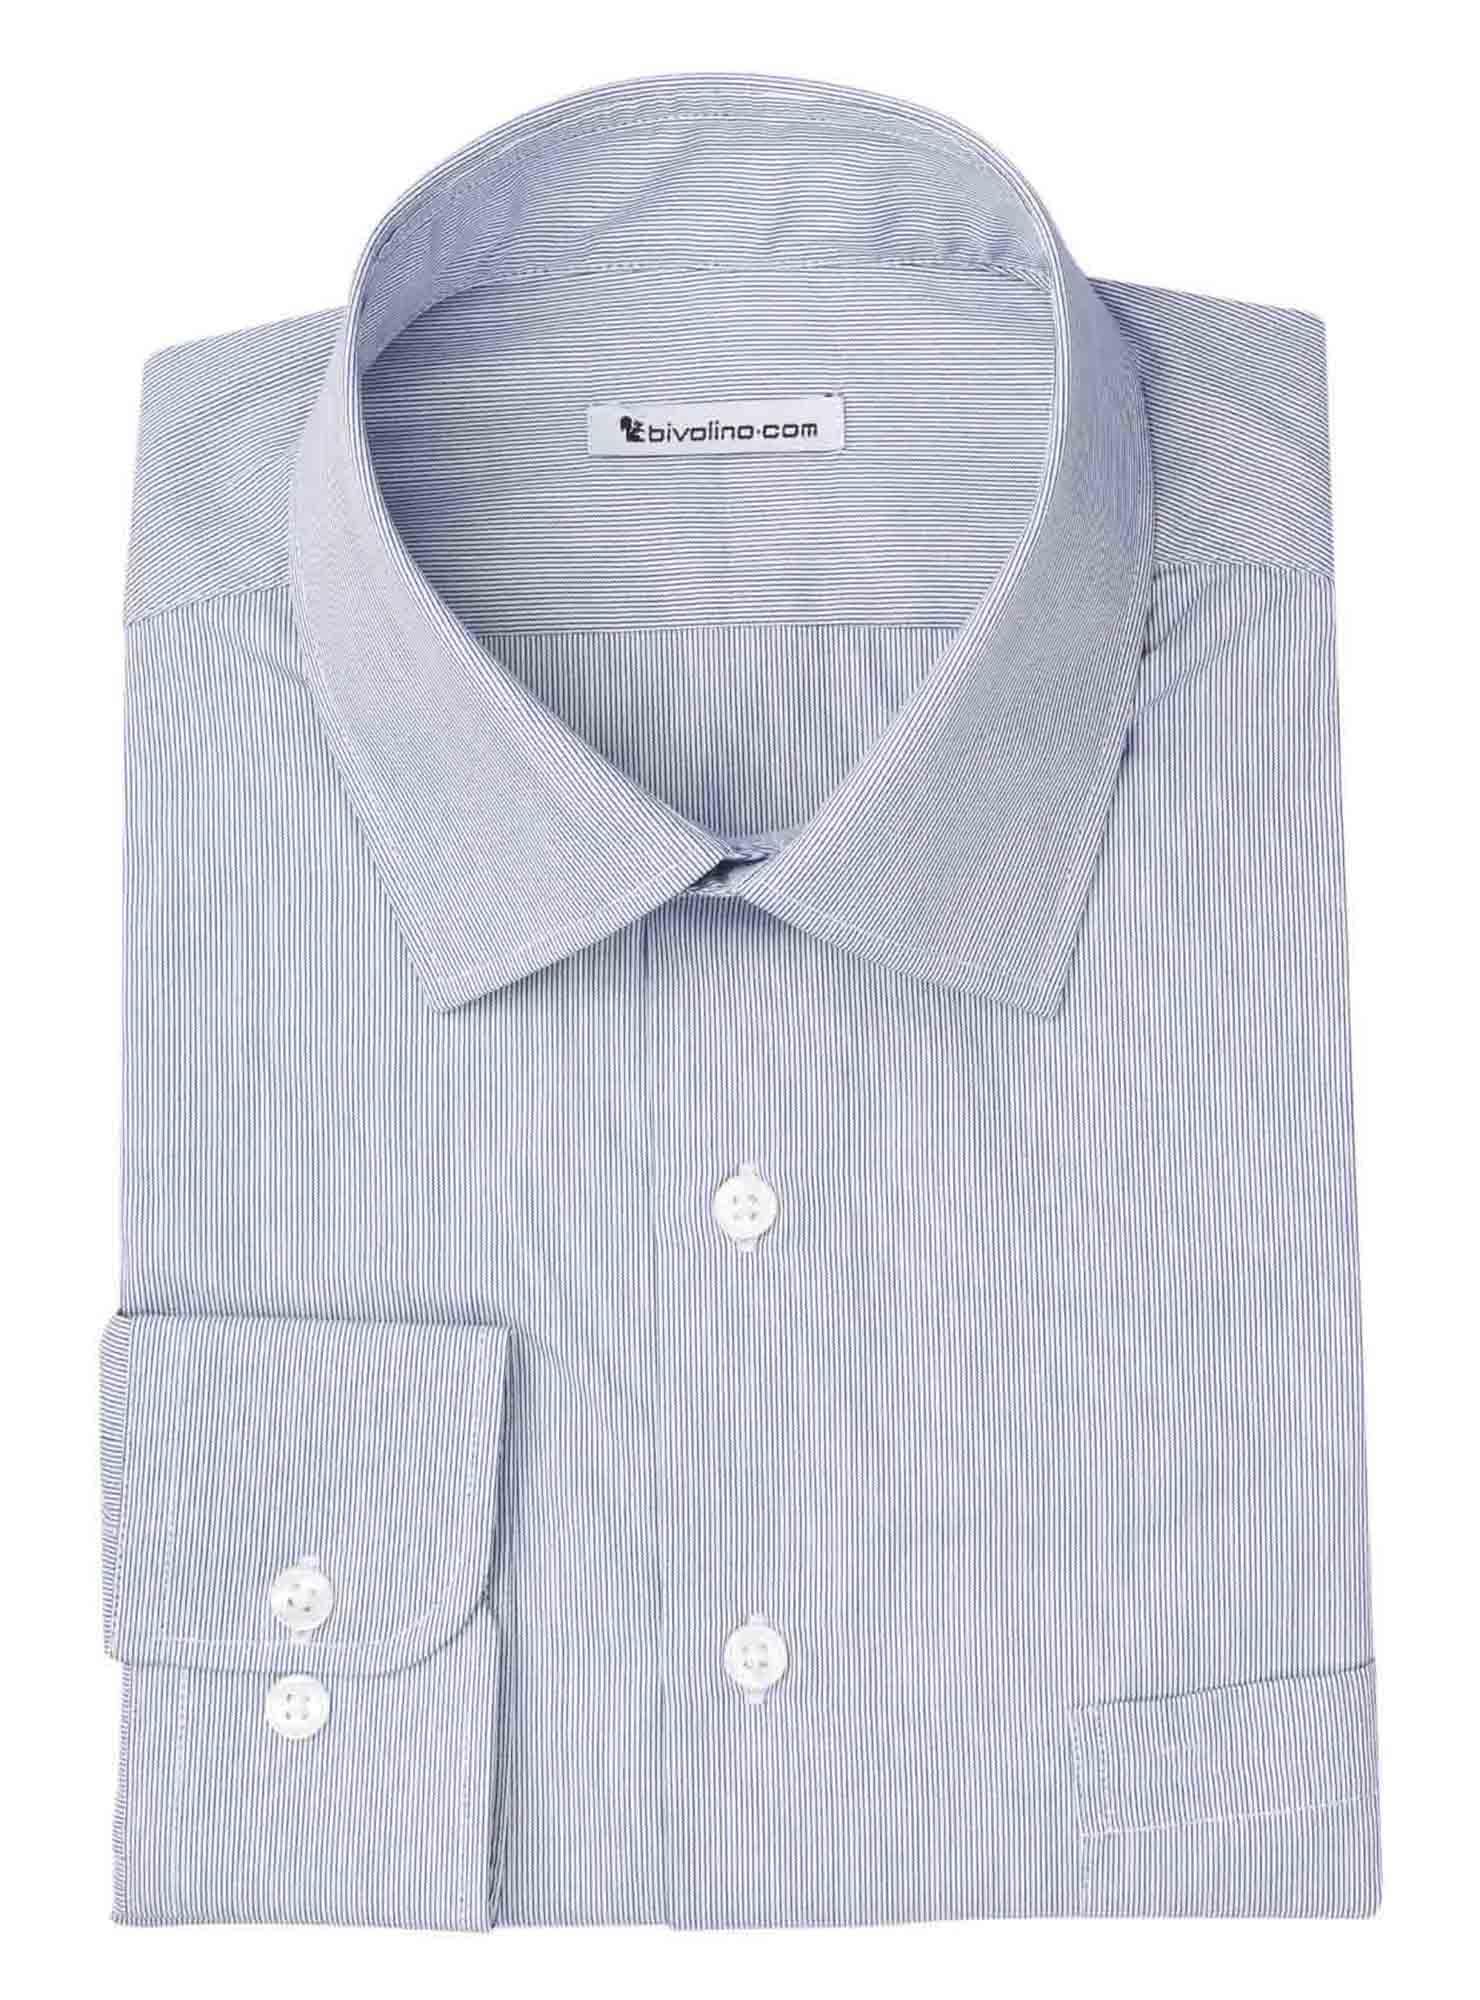 PICCINELLI - Men's shirt cotton milleraye - TUFO 5